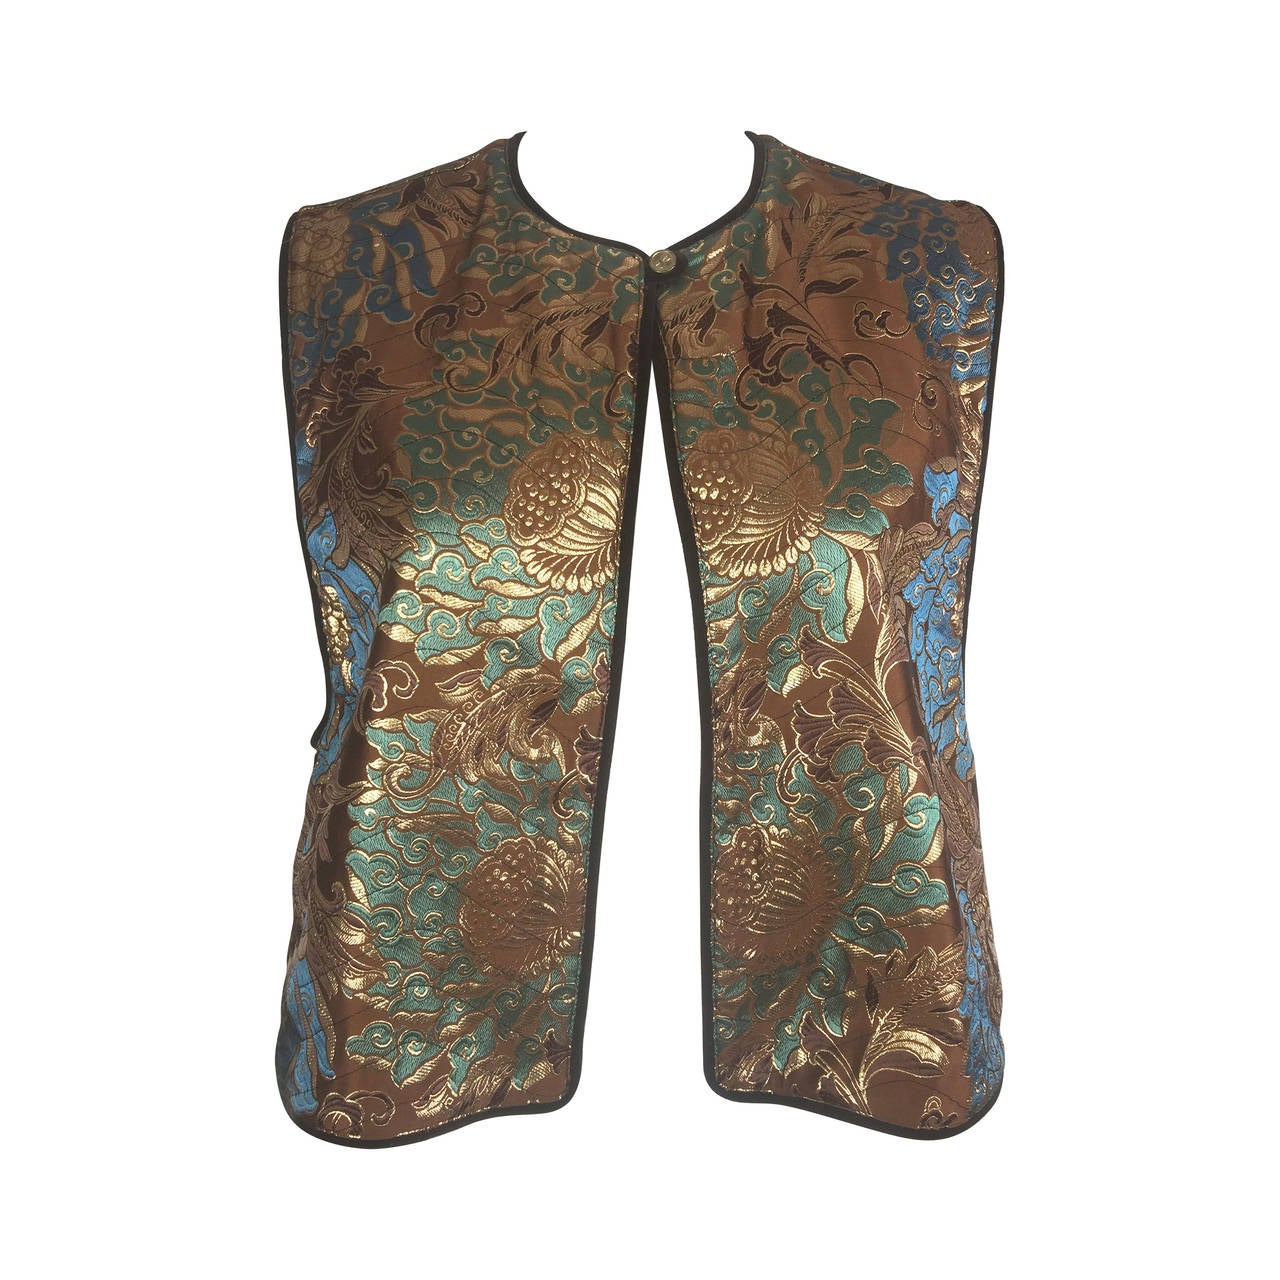 Rare Roberta di Camerino Vintage Waistcoat/Vest.